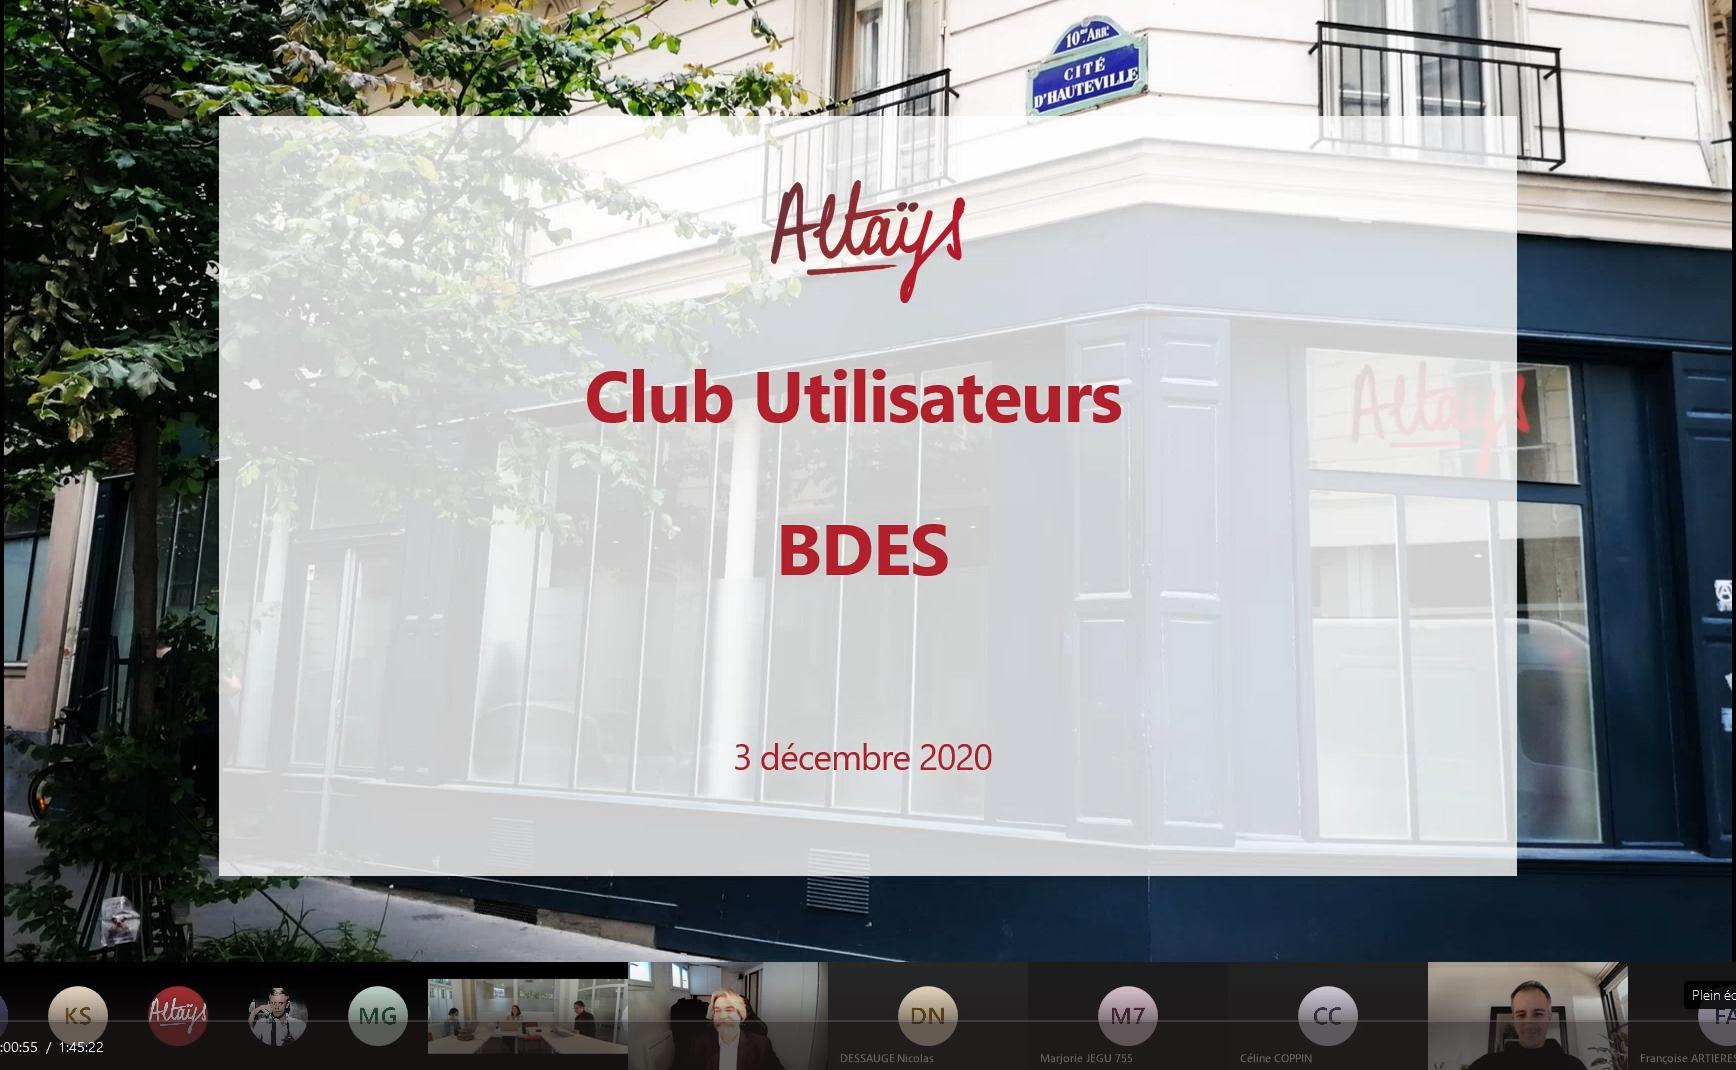 Altays Club jutilisateurs BDES